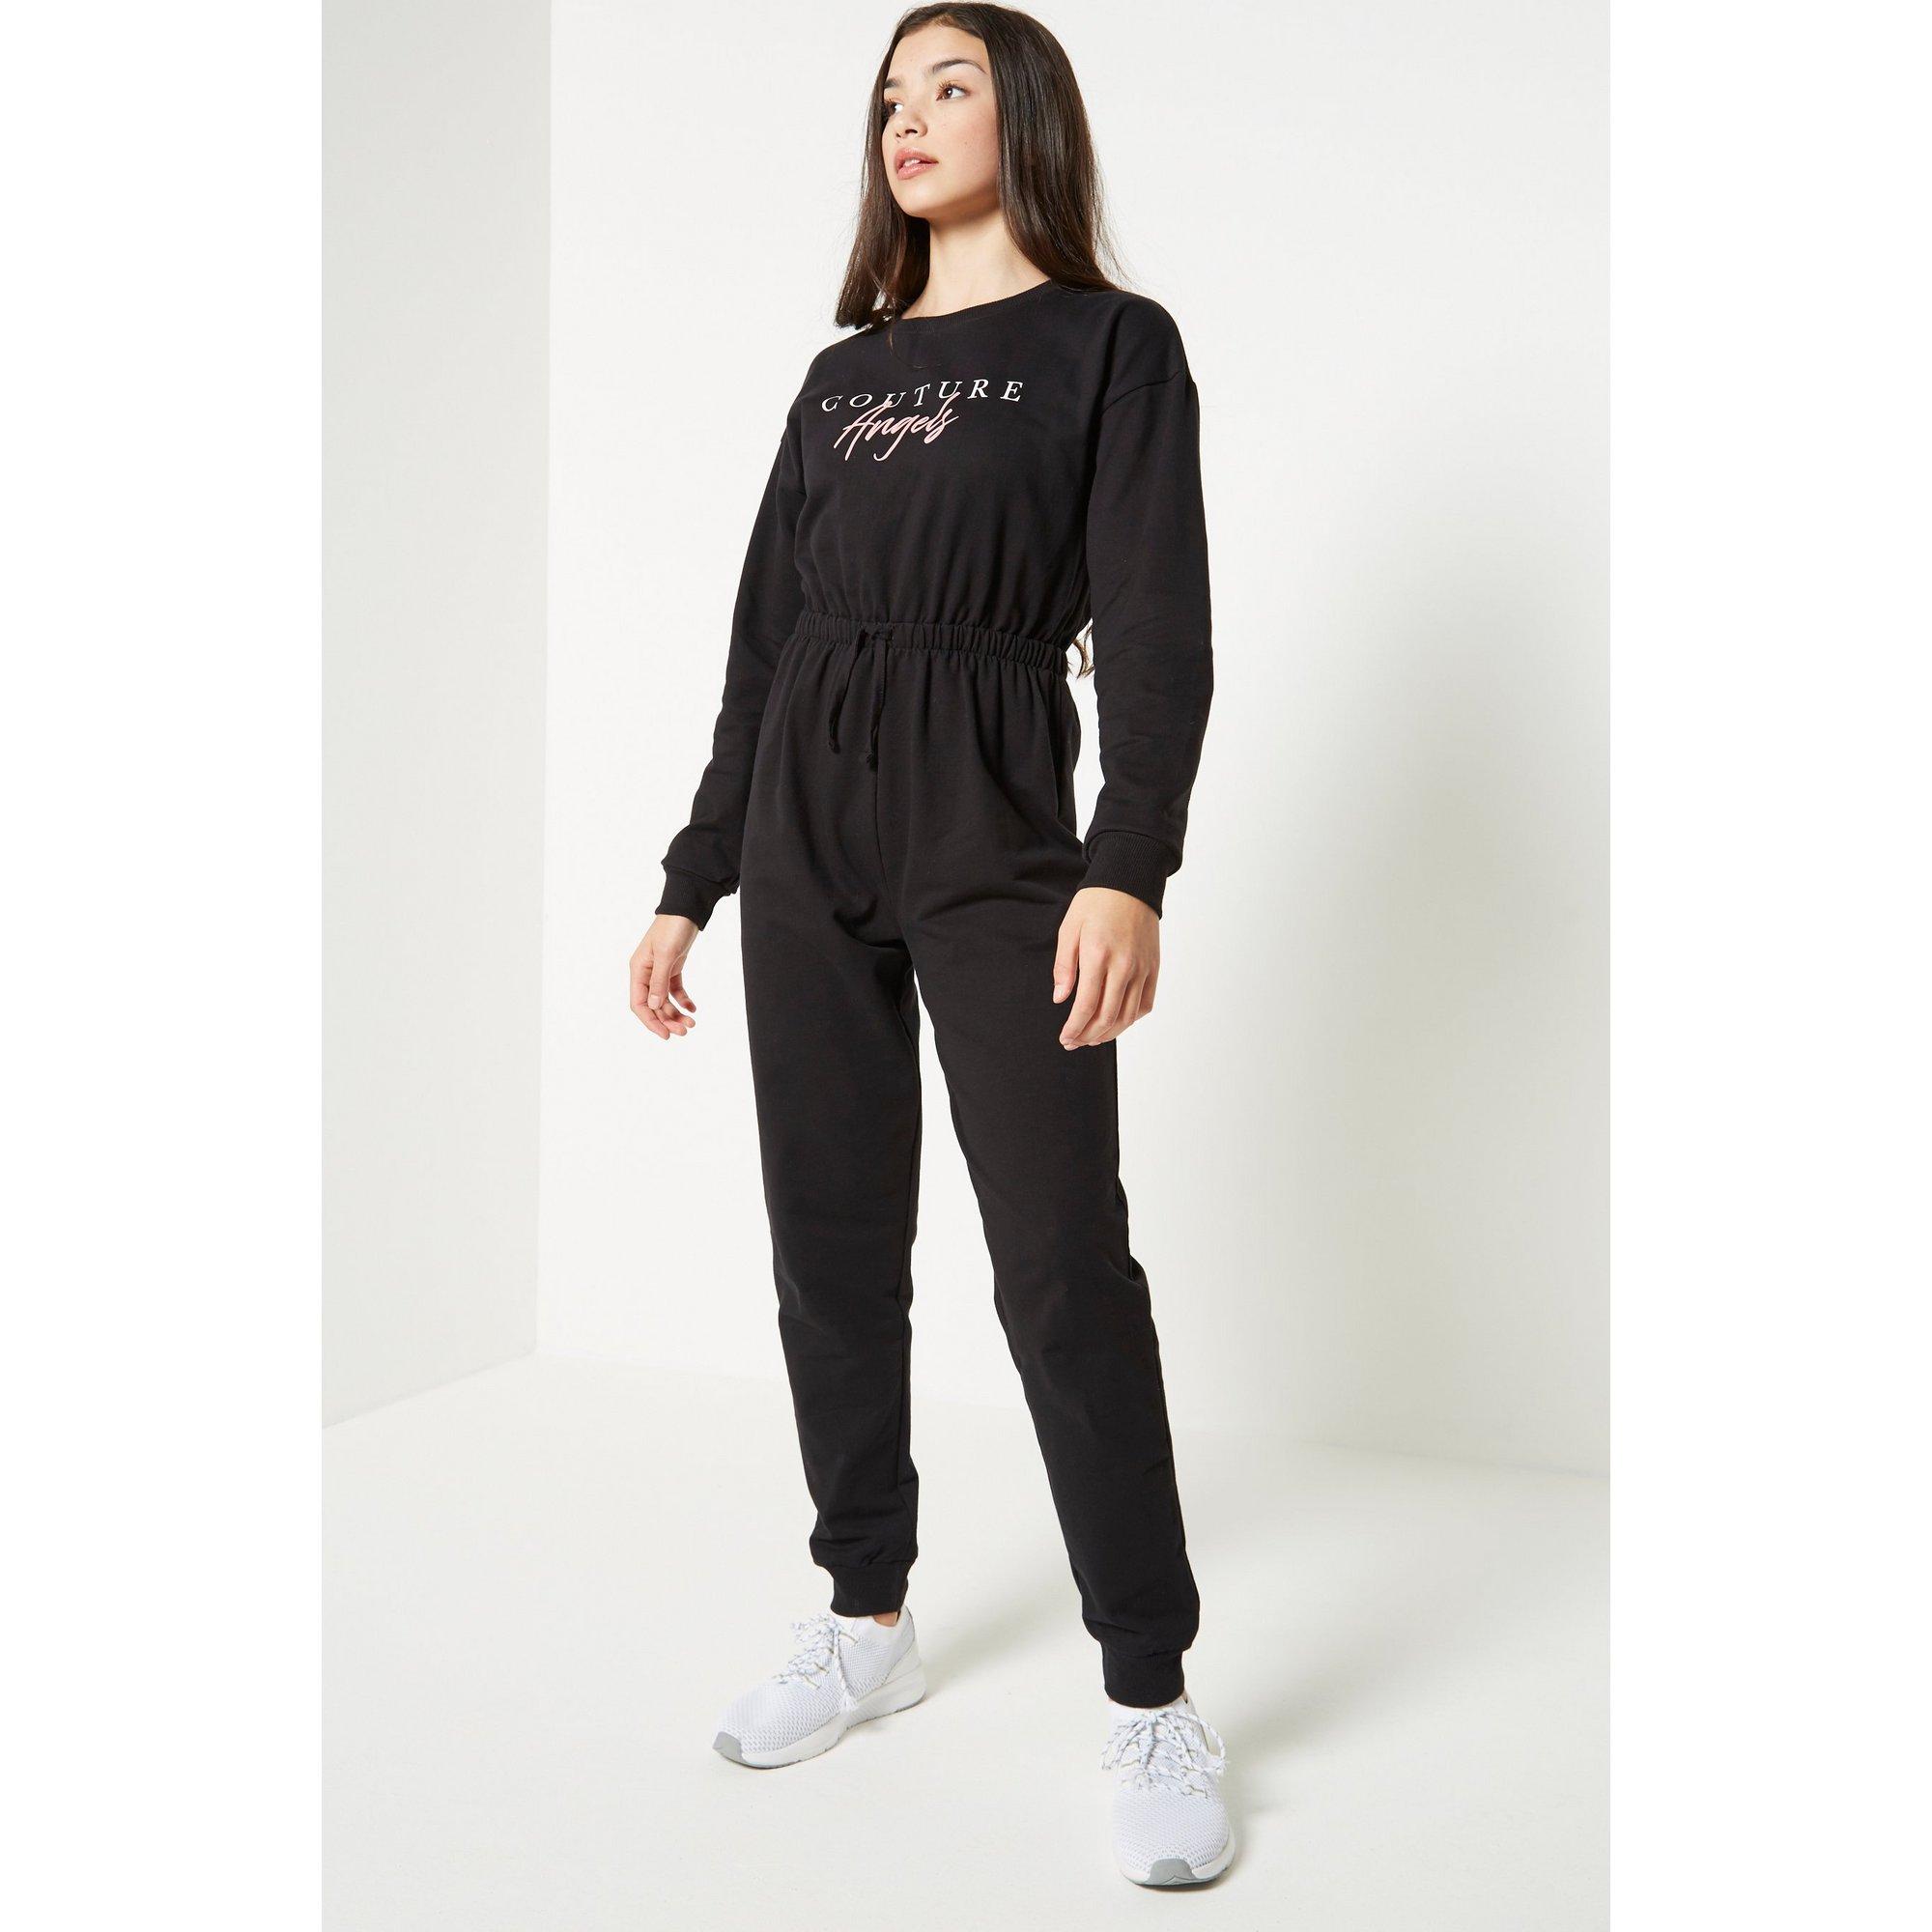 Image of Couture Angels Tie Waist Black Jumpsuit